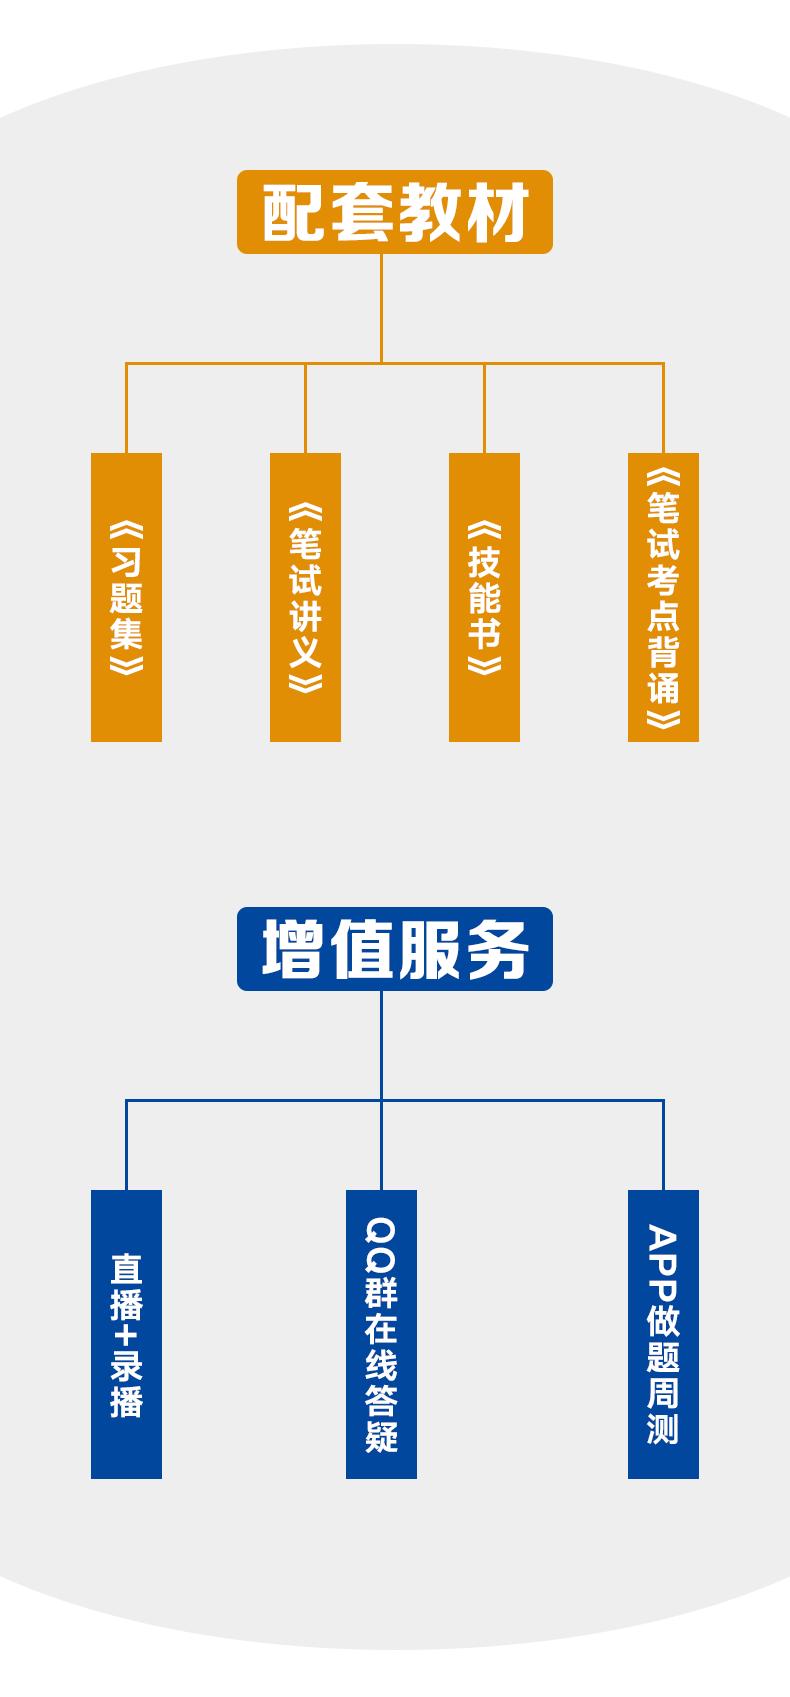 images-网络全程班_05